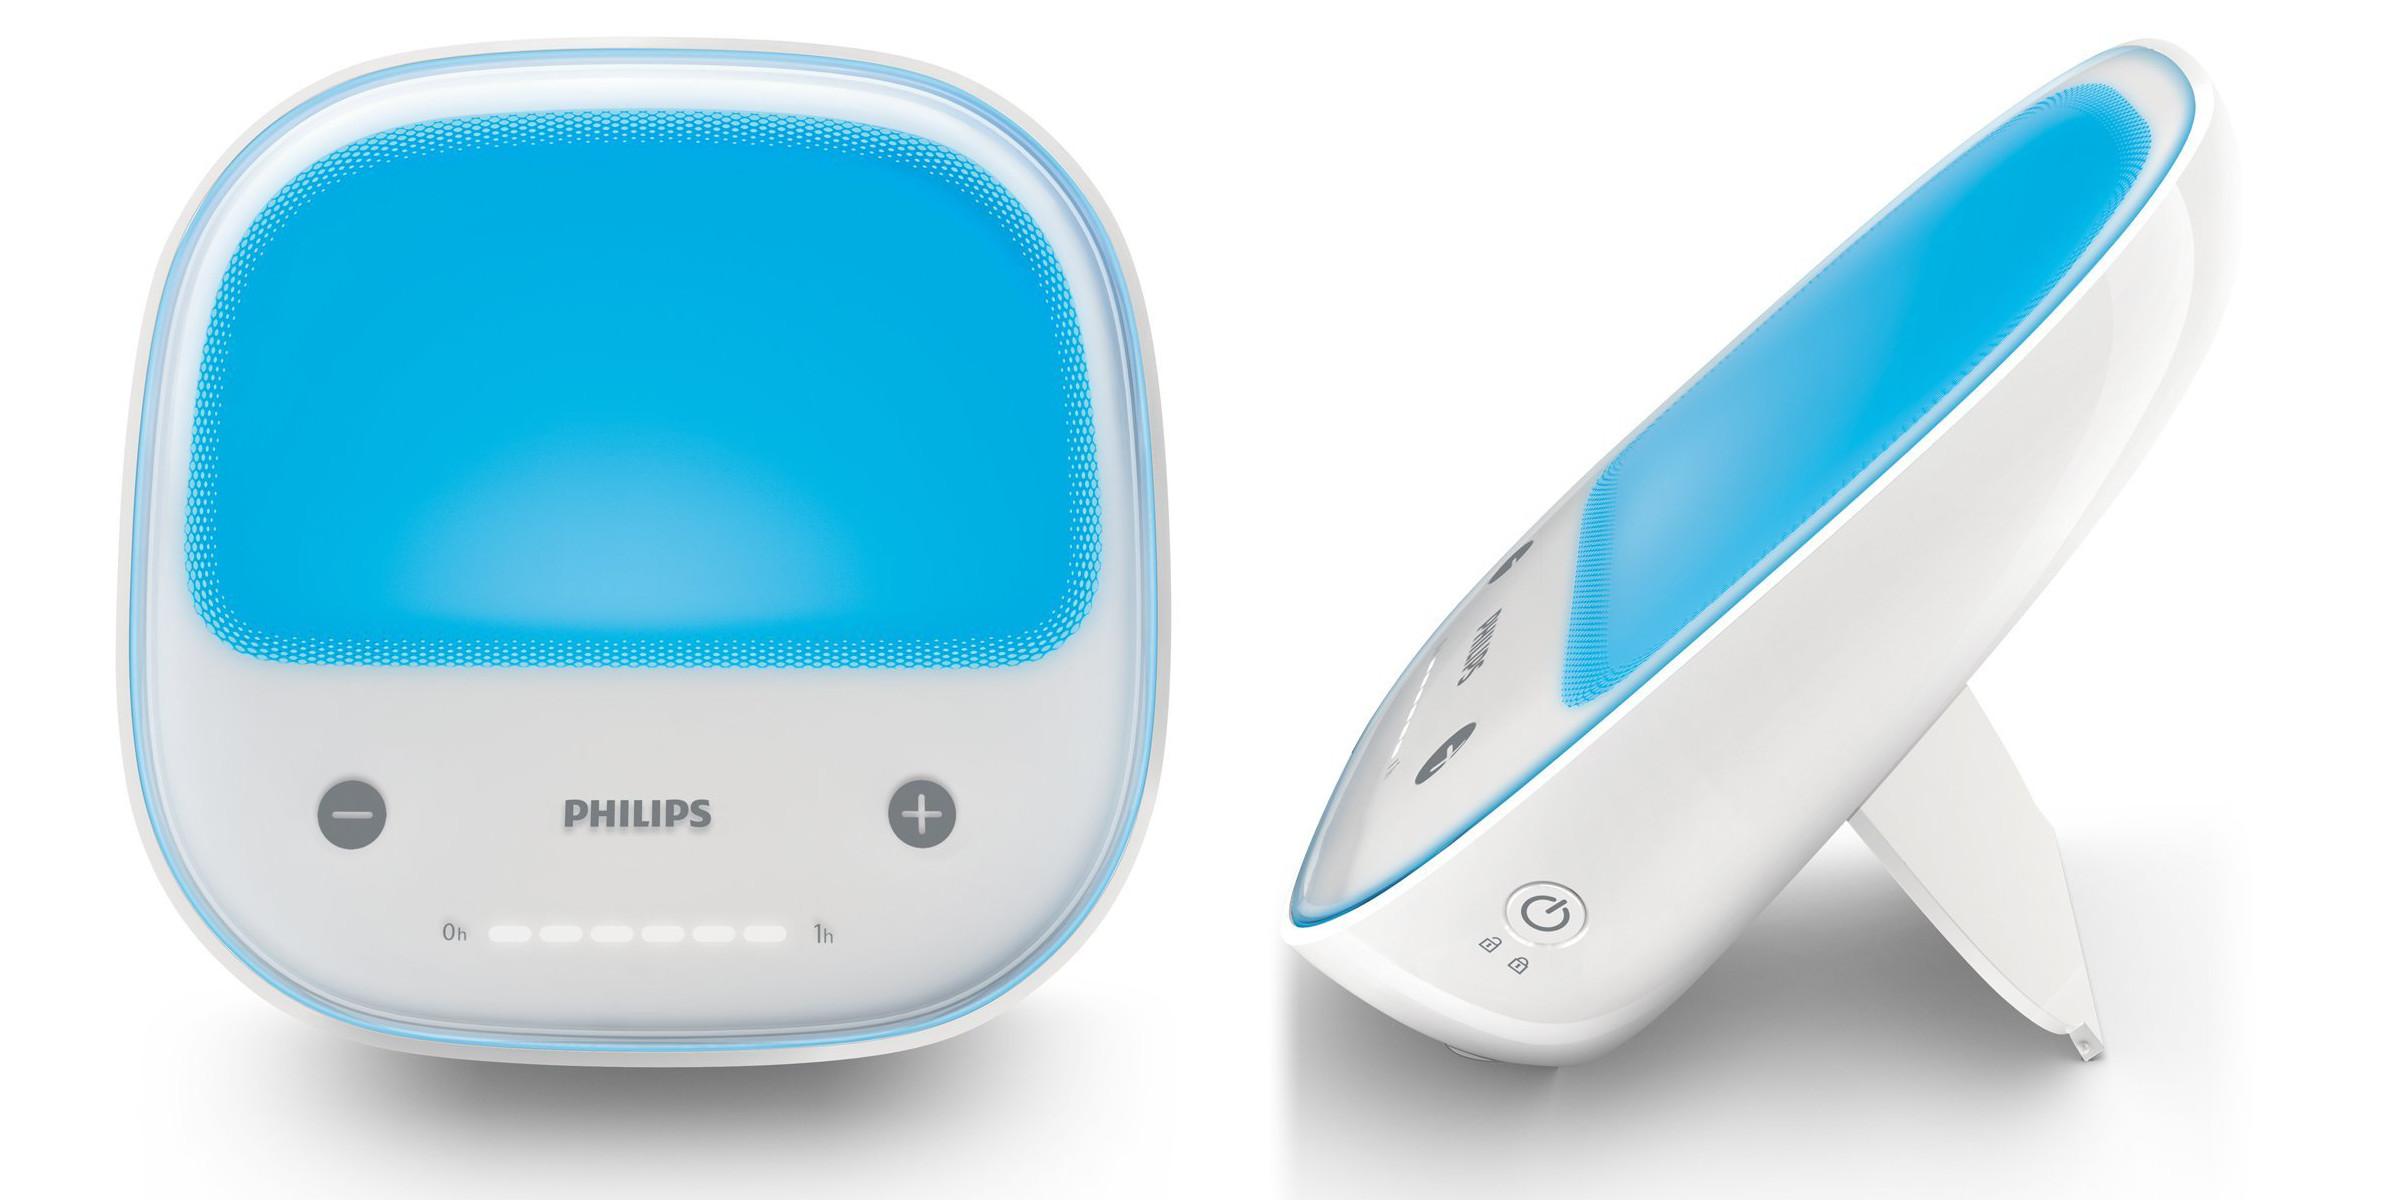 Philips goLITE BLU Energy Light is back down to $68